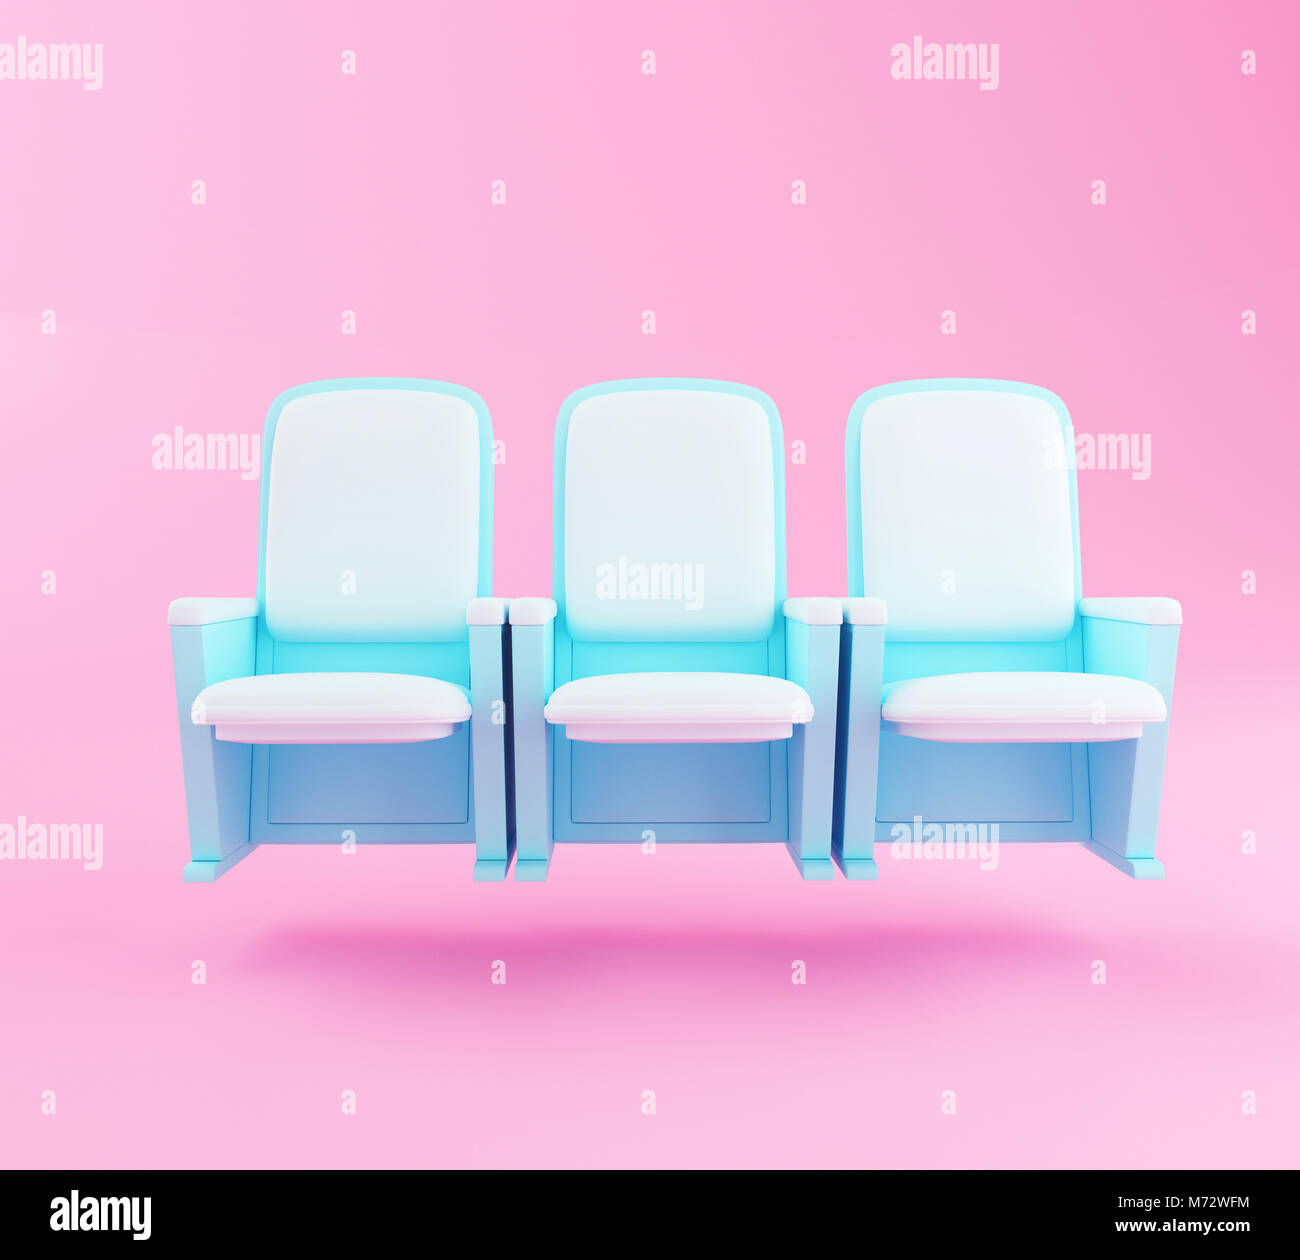 3d Illustration Cartoon Theater Seats On Pink Background Cinema And Stock Photo Alamy